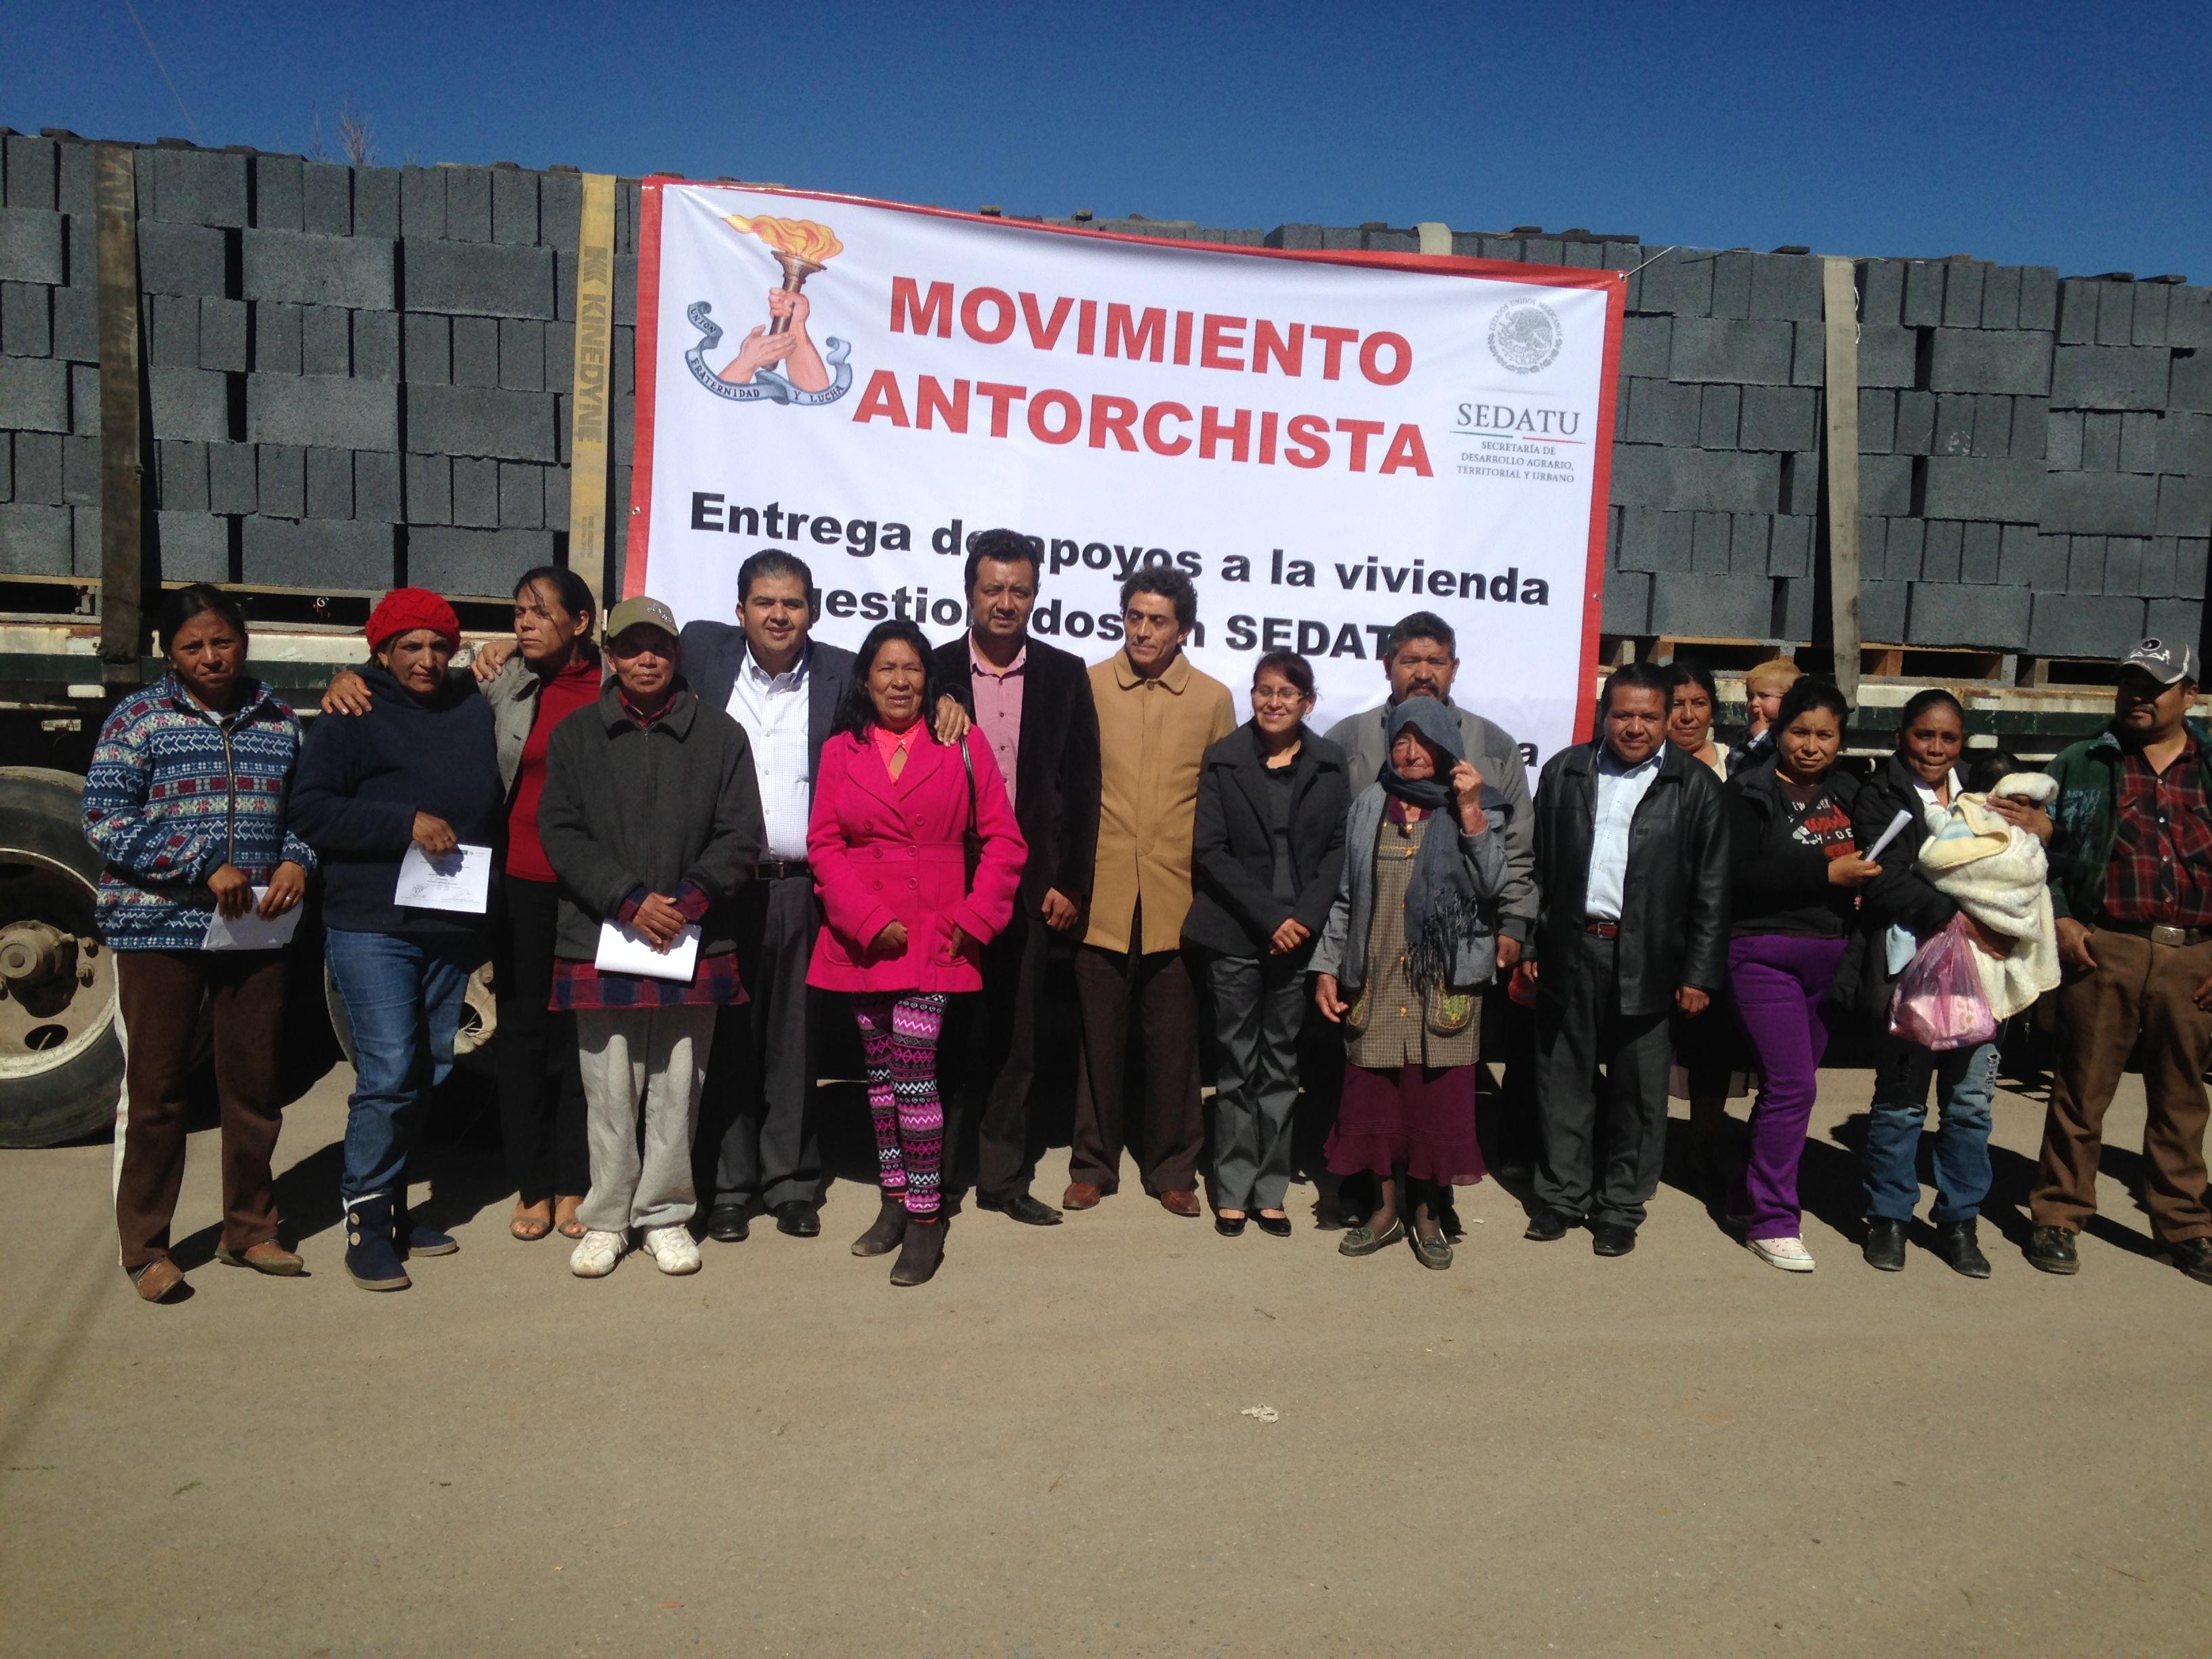 estudio or municipio or fresnillo: